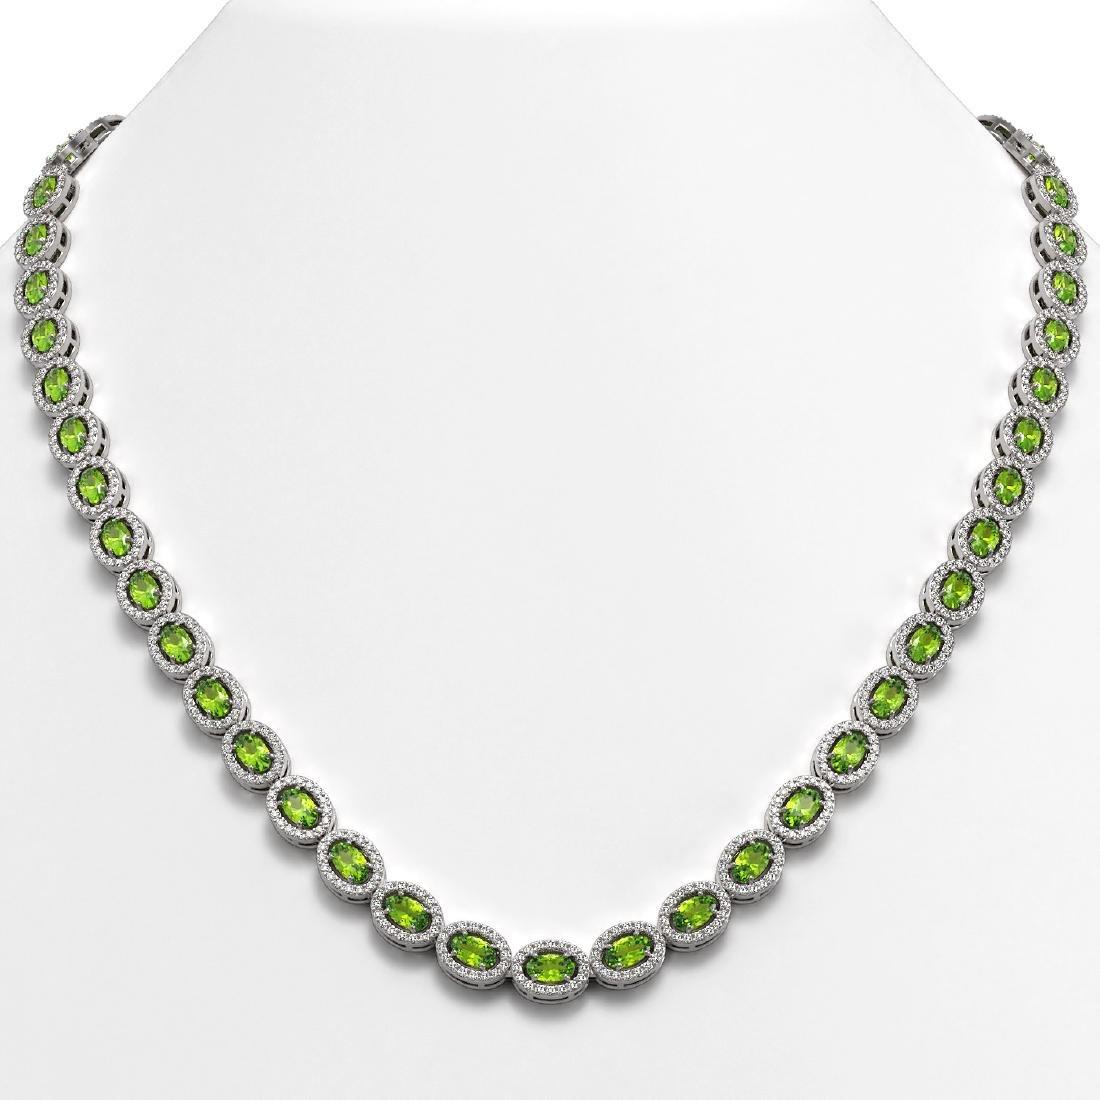 23.86 CTW Peridot & Diamond Halo Necklace 10K White